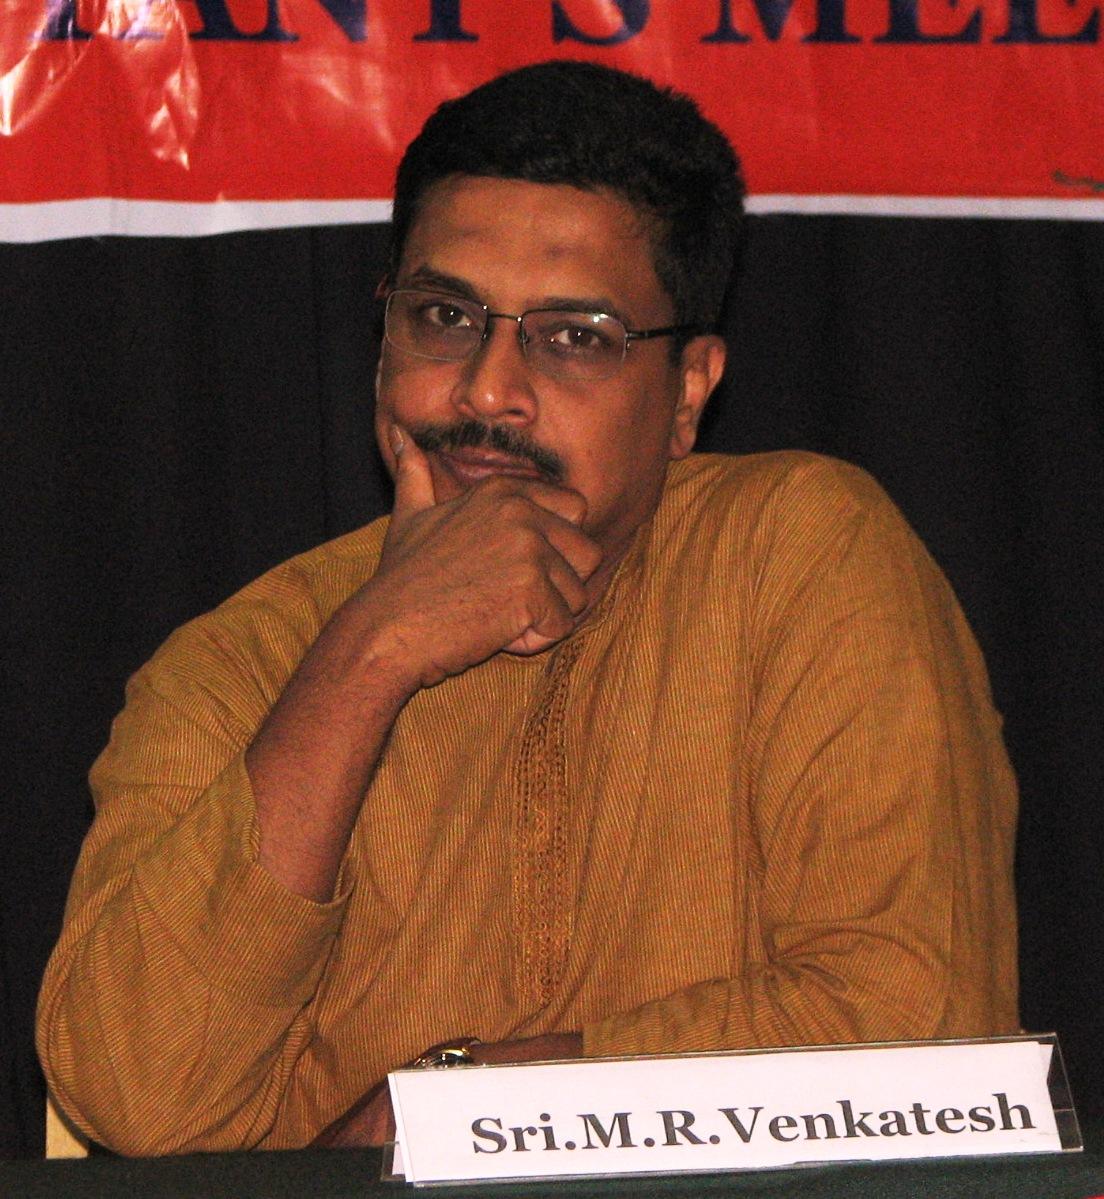 Bangalore: M R Venkatesh to speak on 'India's Black Money Abroad'